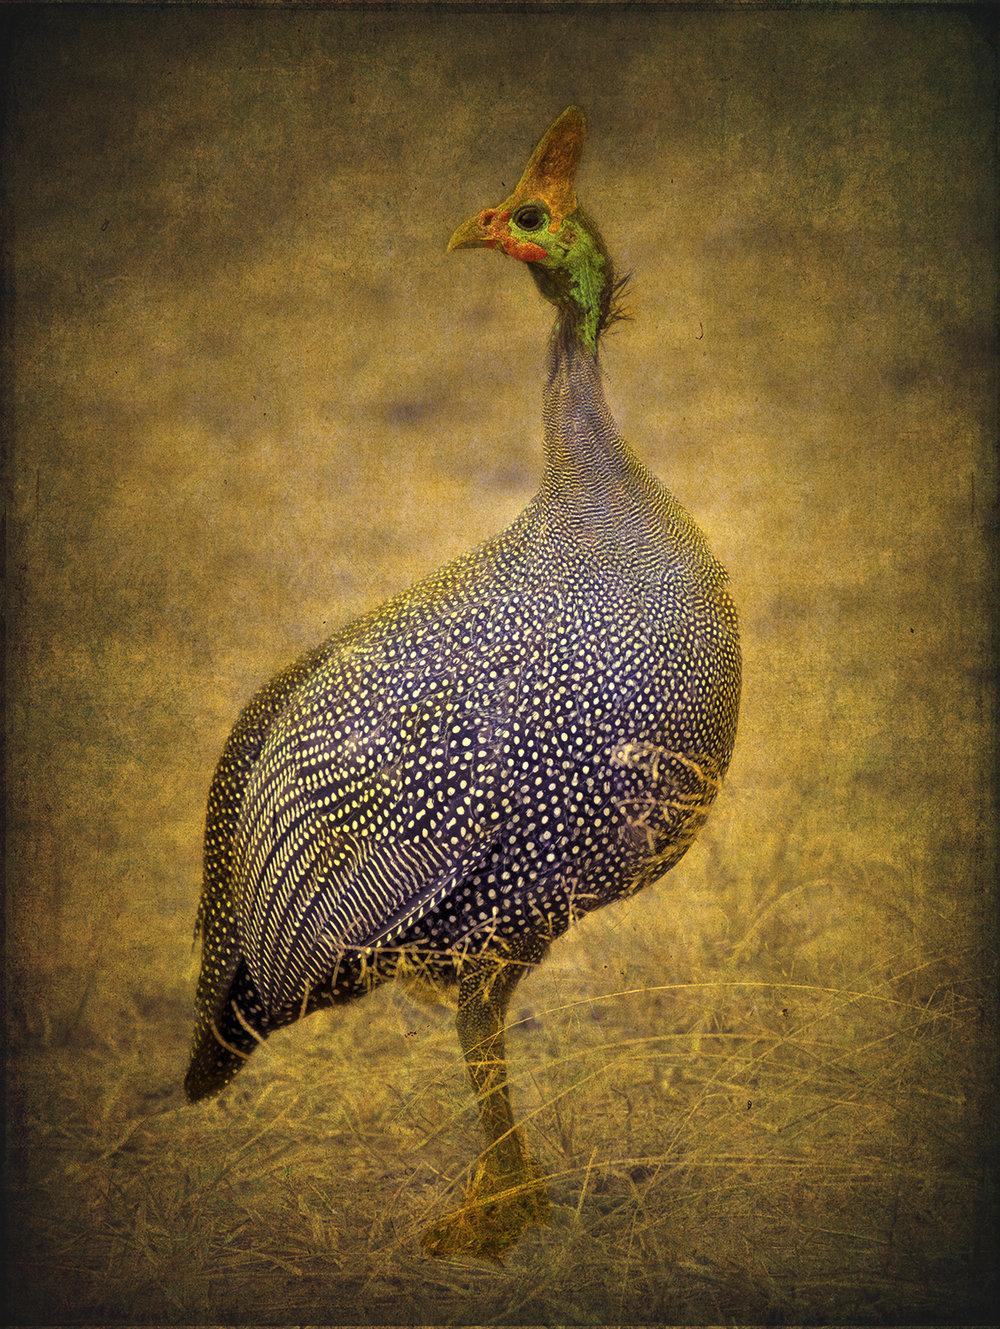 Great Speckled Bird copy.jpg